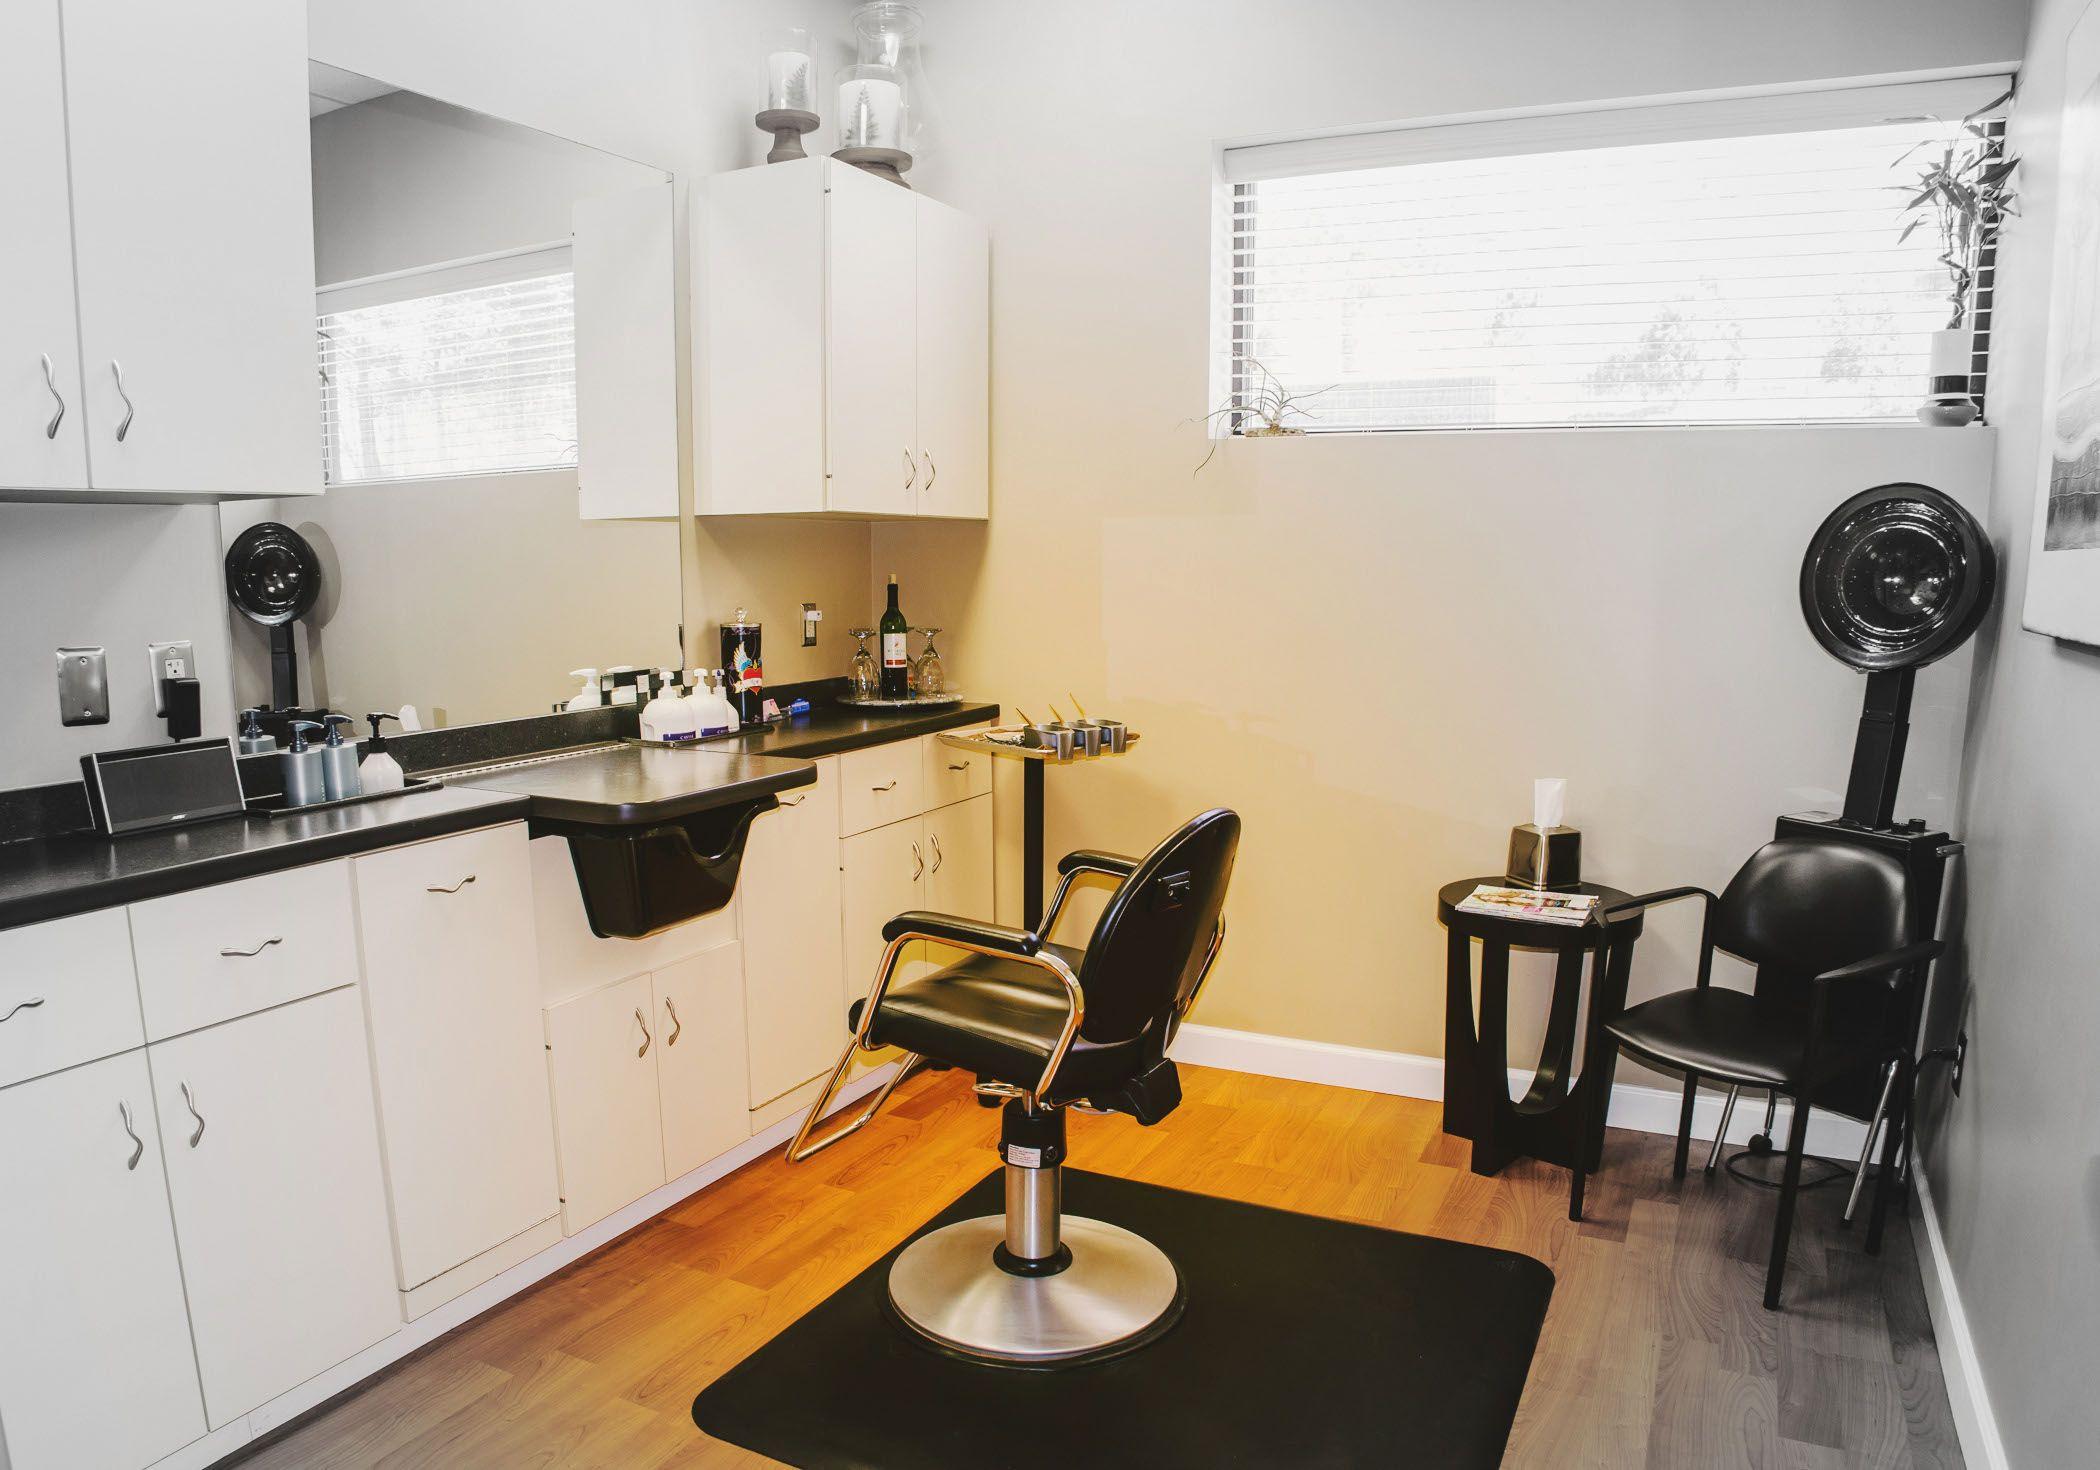 Ordinaire Small Home Hair Salon! | House Stuff | Pinterest | Salons, Salon Ideas And  Future